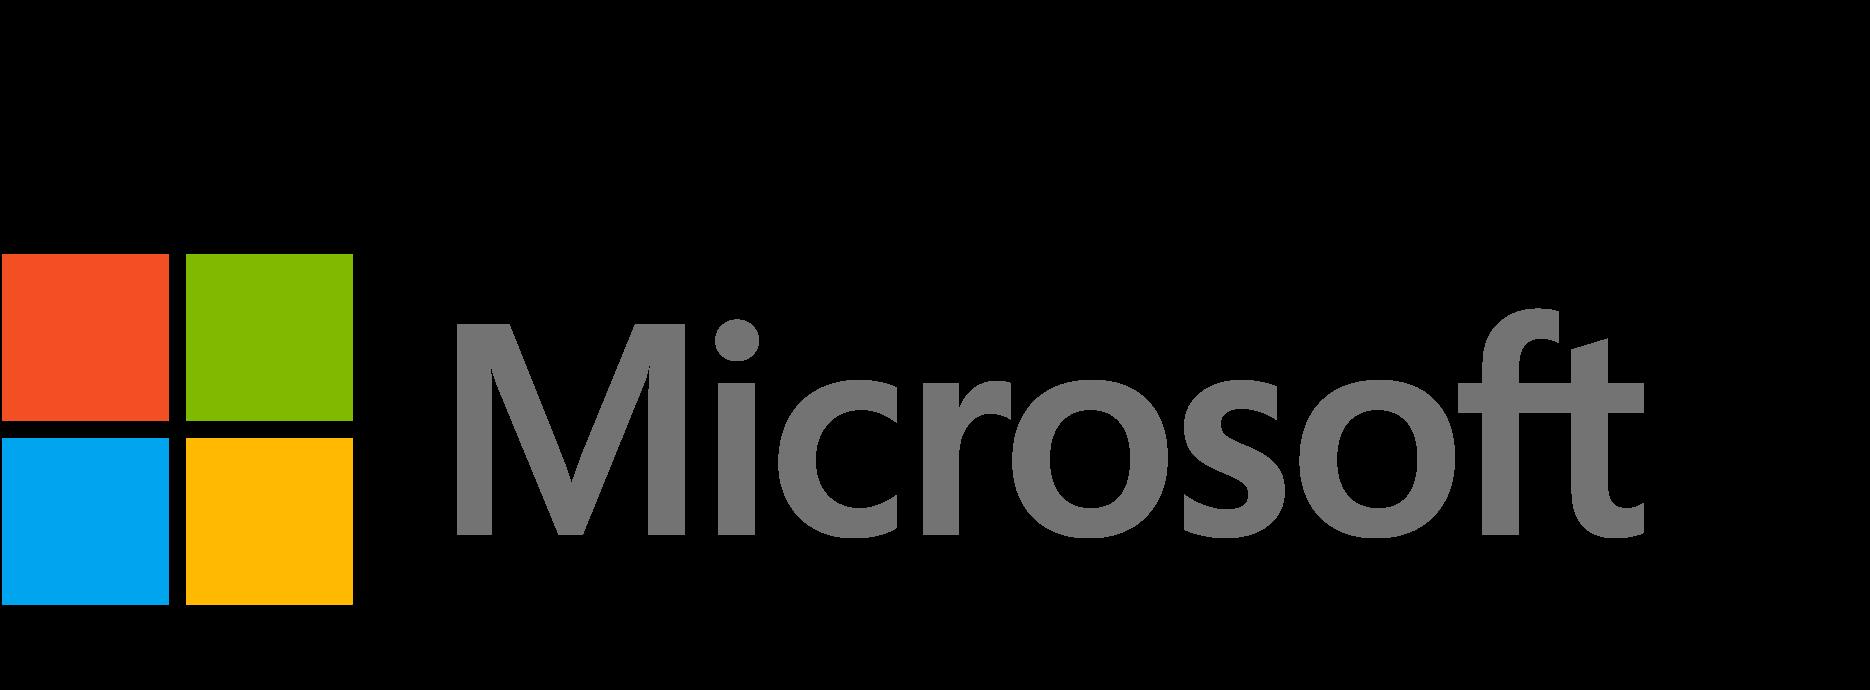 microsoft-logo-png-transparent-20 - Pathway CTM